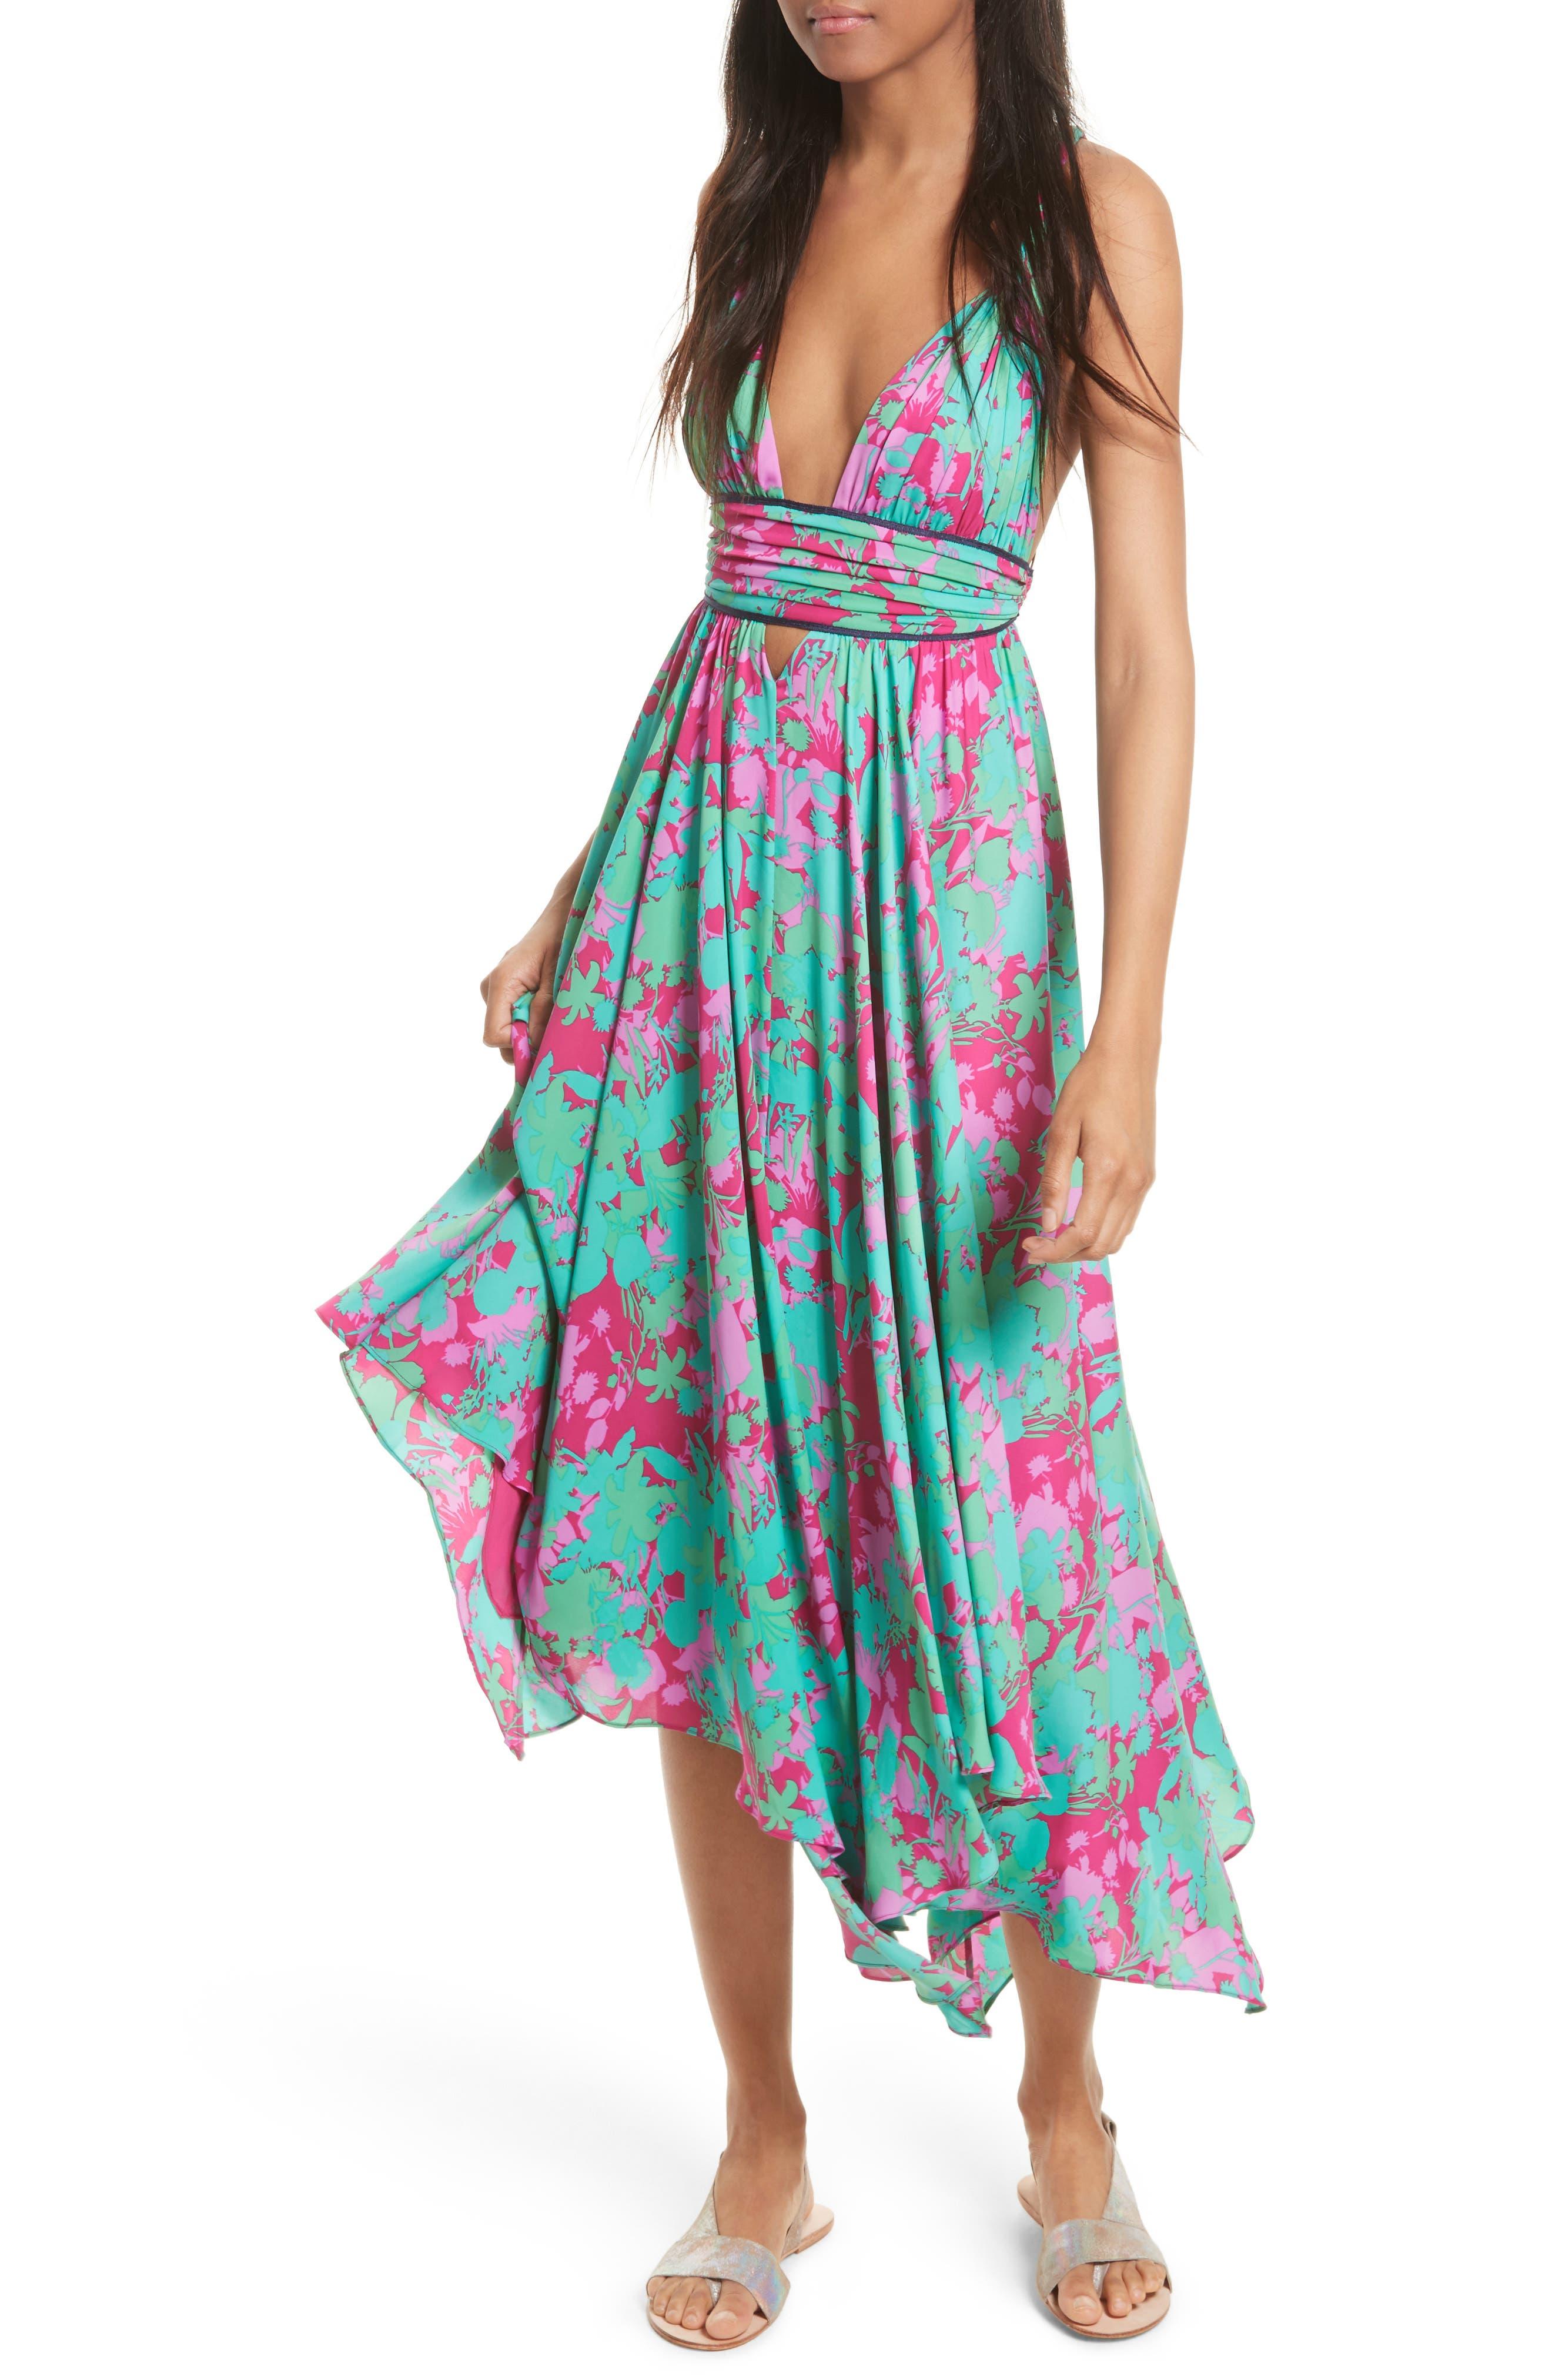 Alternate Image 1 Selected - Free People Summer Night Maxi Dress